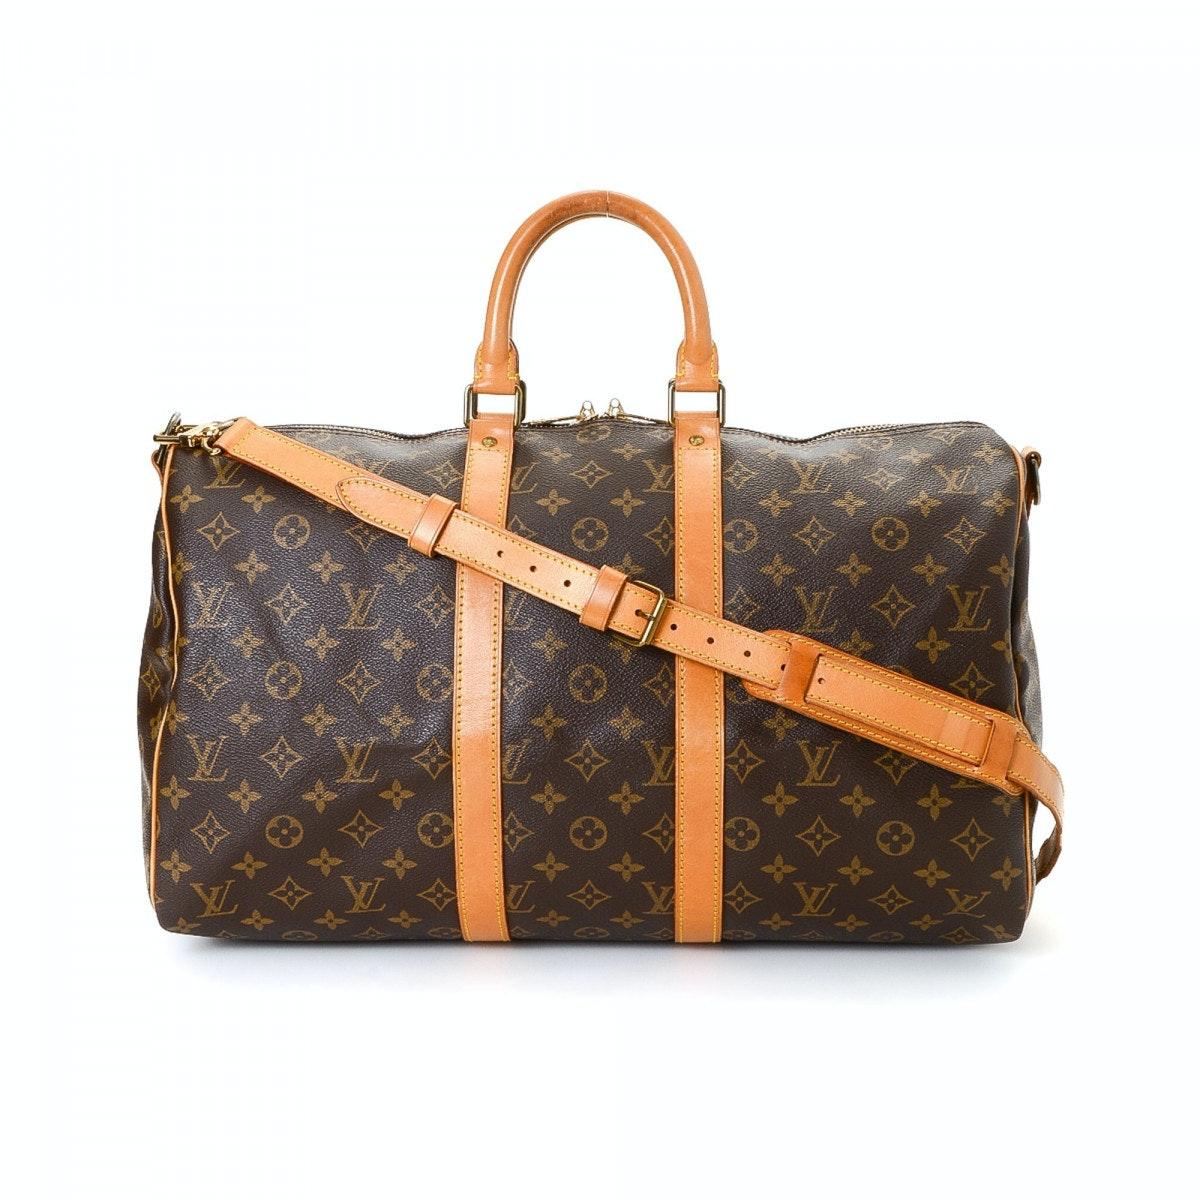 Louis Vuitton Keepall Bandouliere Monogram 45 Brown